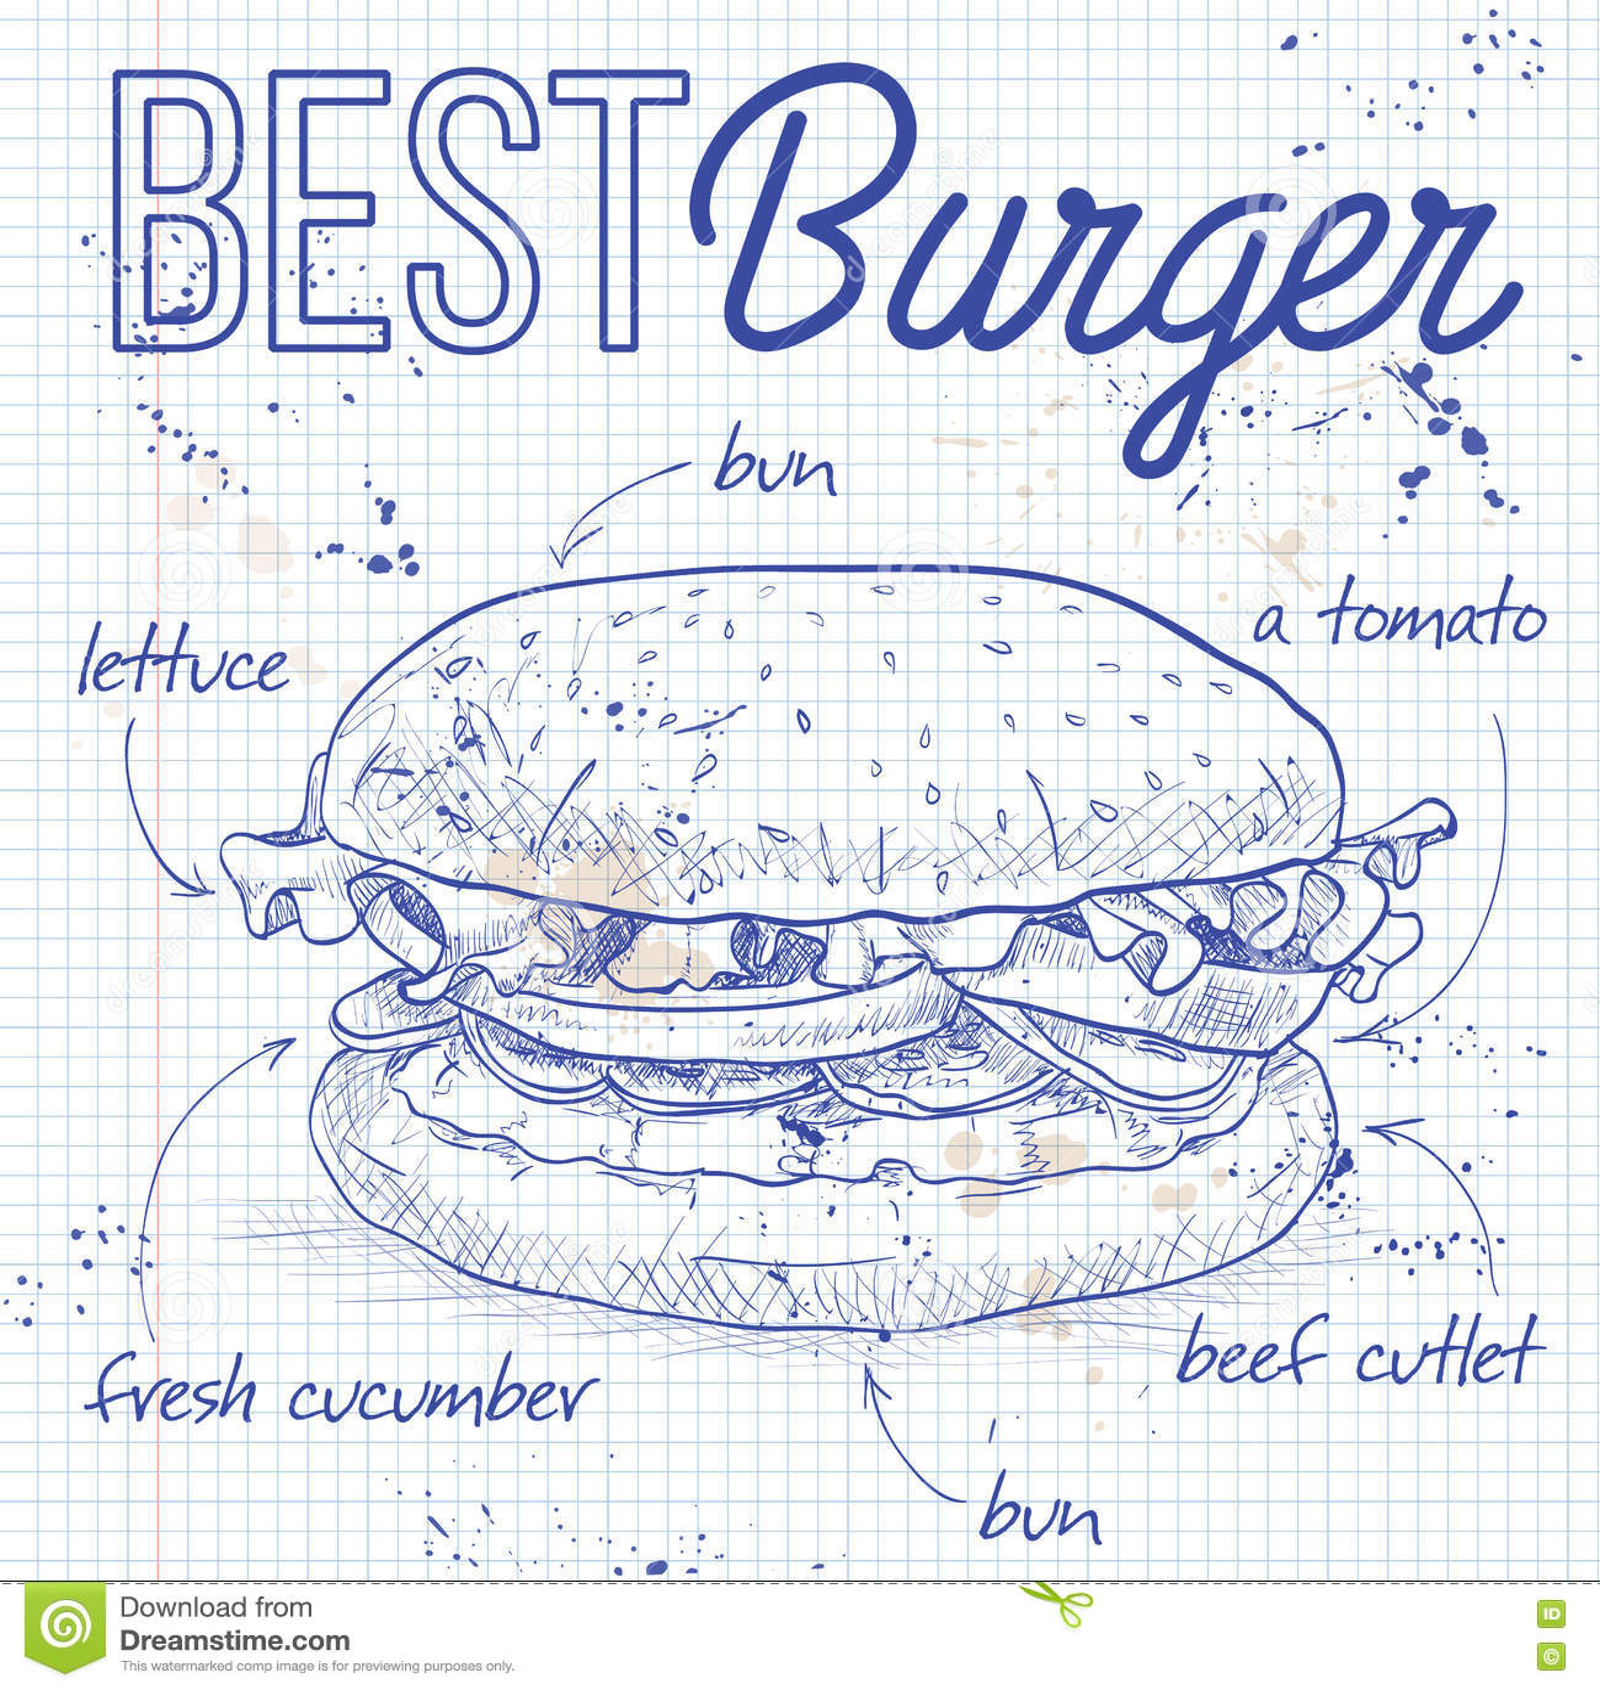 Burger συνταγή σε μια σελίδα σημειωματάριων